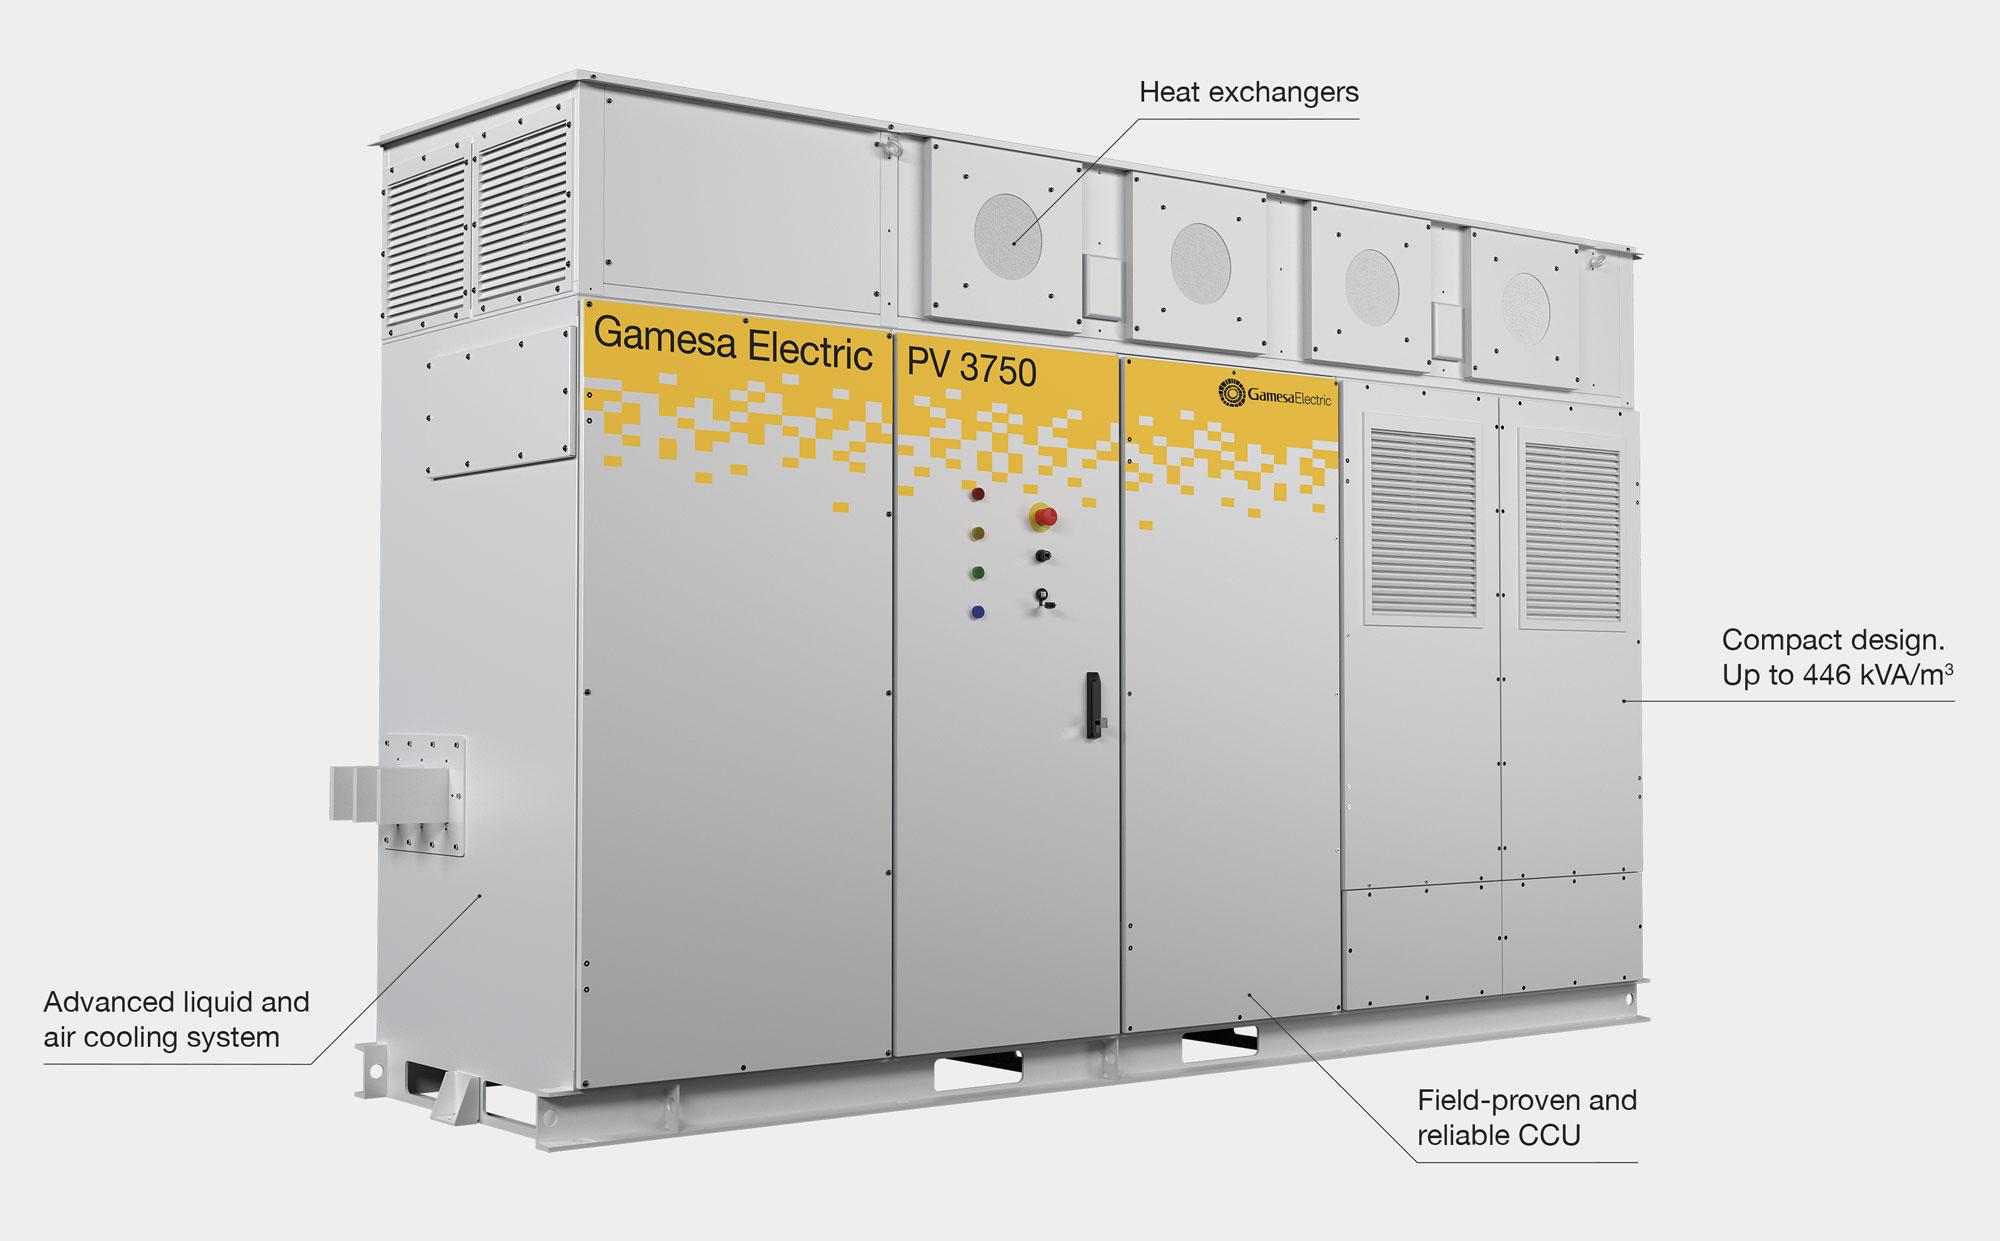 Gamesa Electric PV 3750